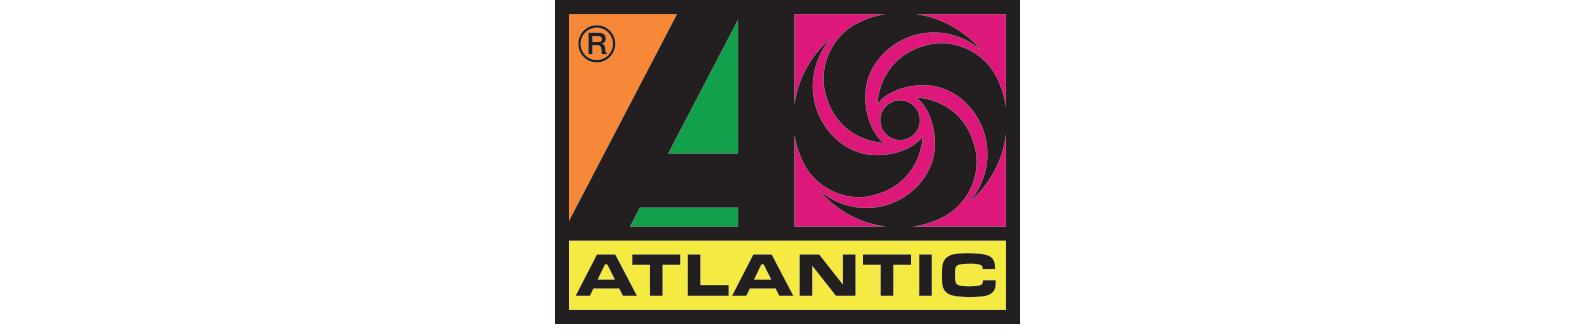 atlanticlogo.png